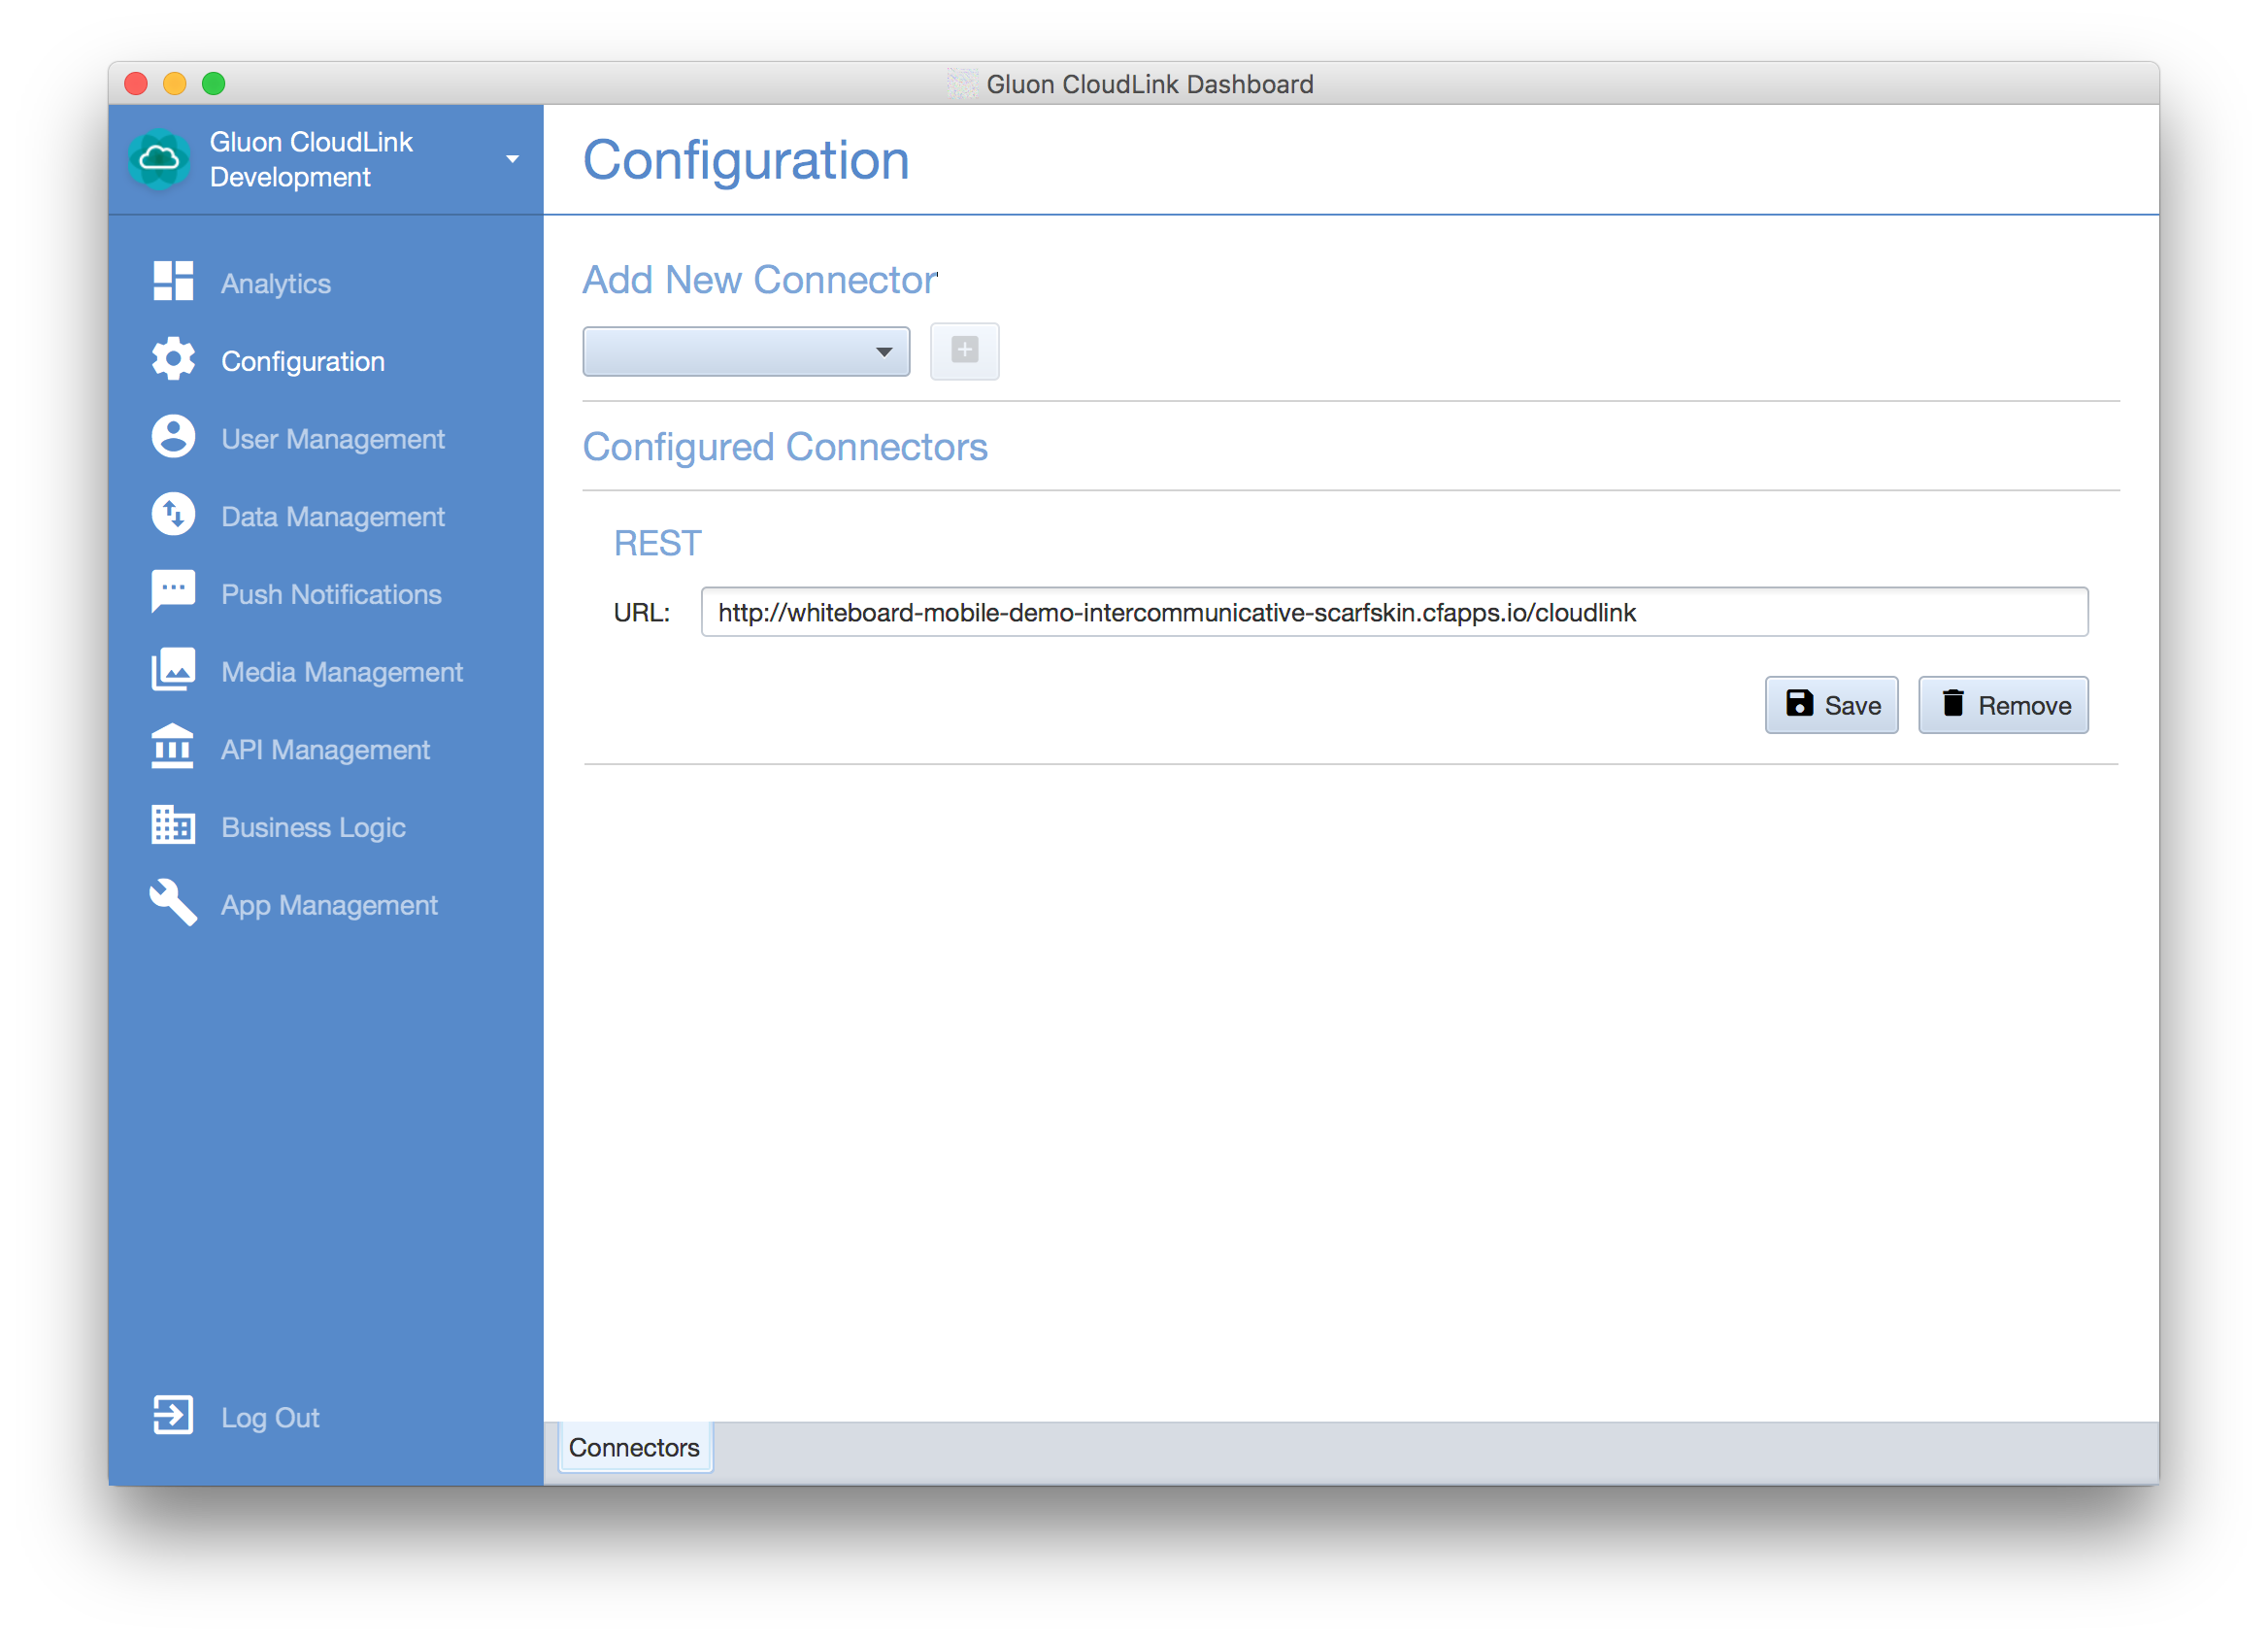 Gluon CloudLink PWS Connector Dashboard